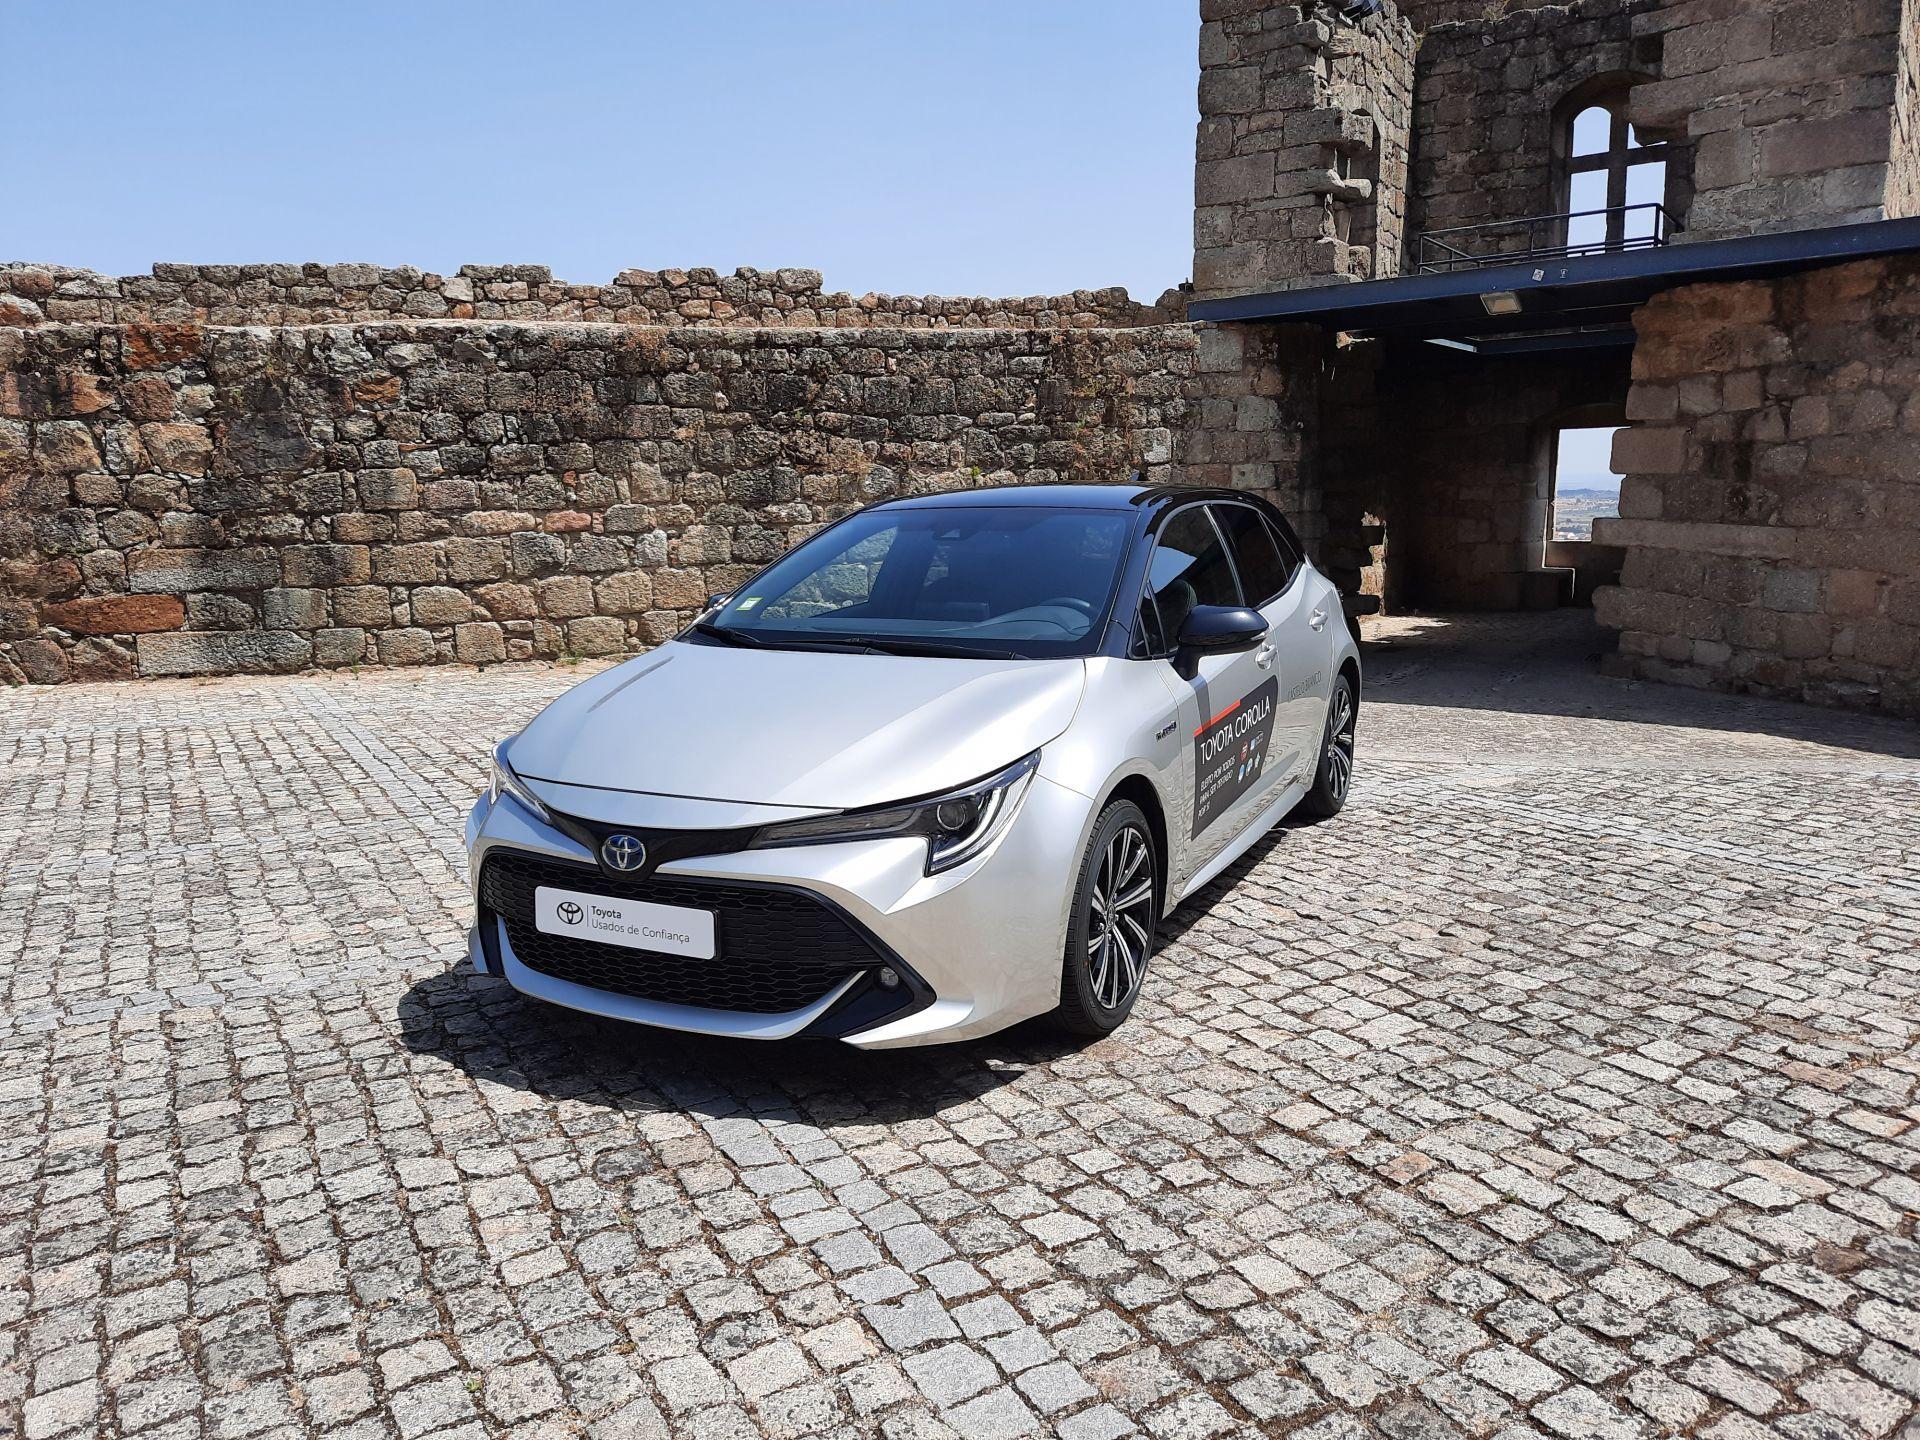 Toyota Corolla 1.8 Hybrid SQUARE Collection usada Castelo Branco